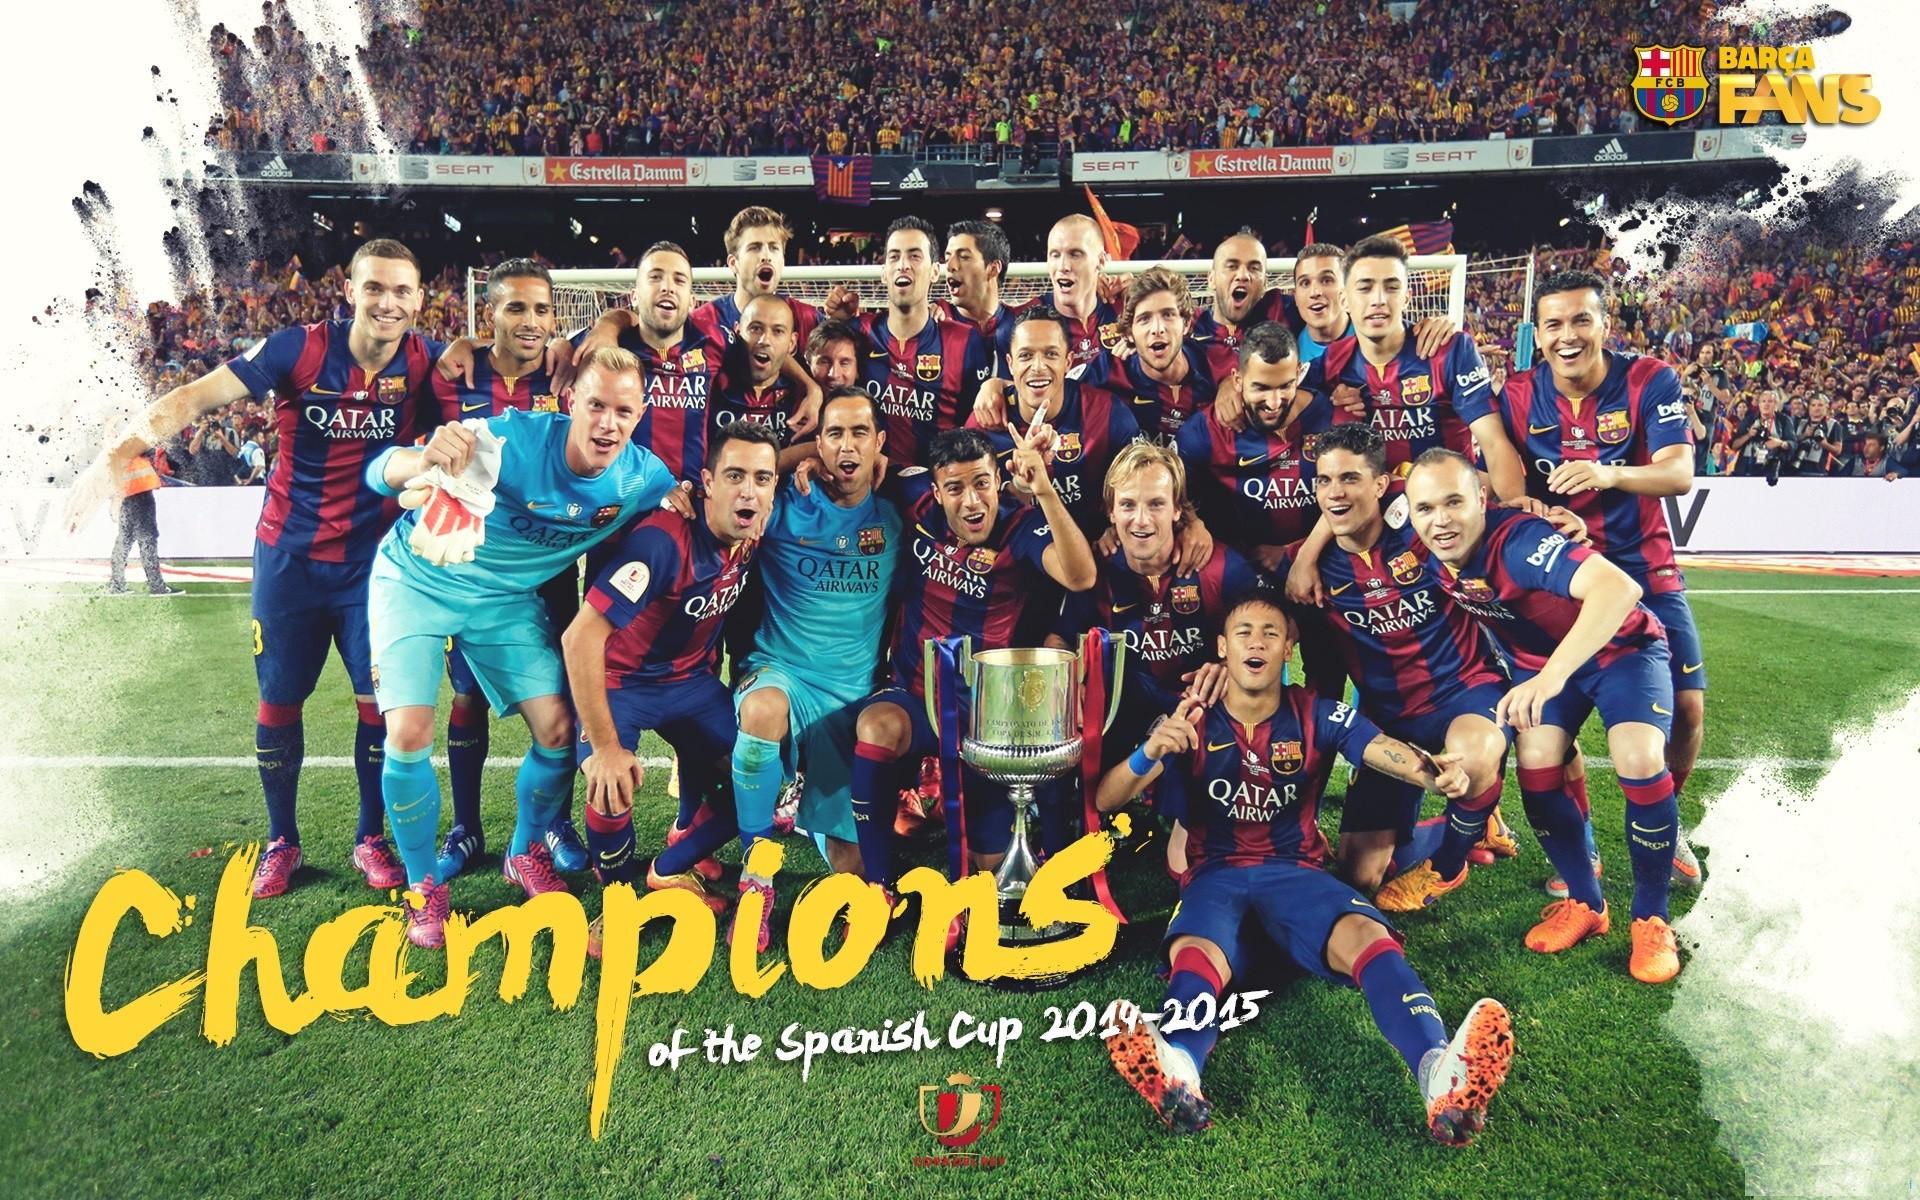 FC Barcelona Wallpaper HD 2015 – WallpaperSafari | Android | Pinterest | FC  Barcelona